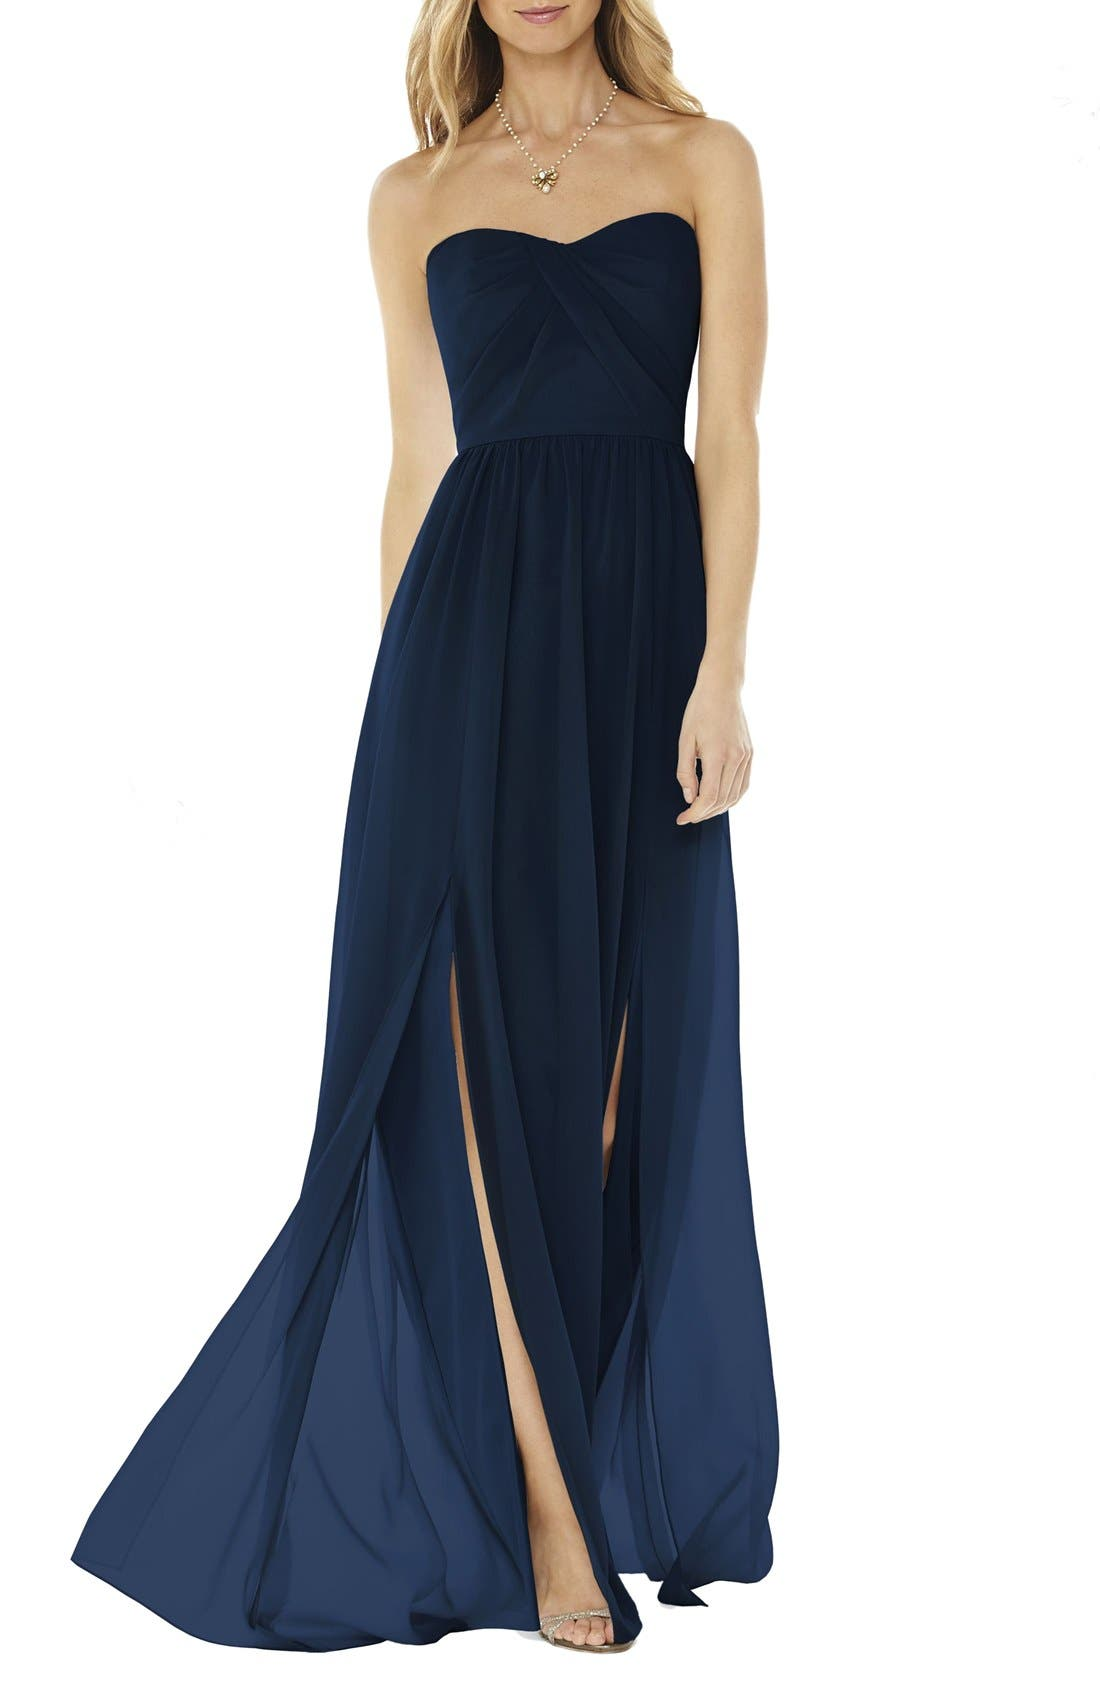 Prom dress nordstrom 341